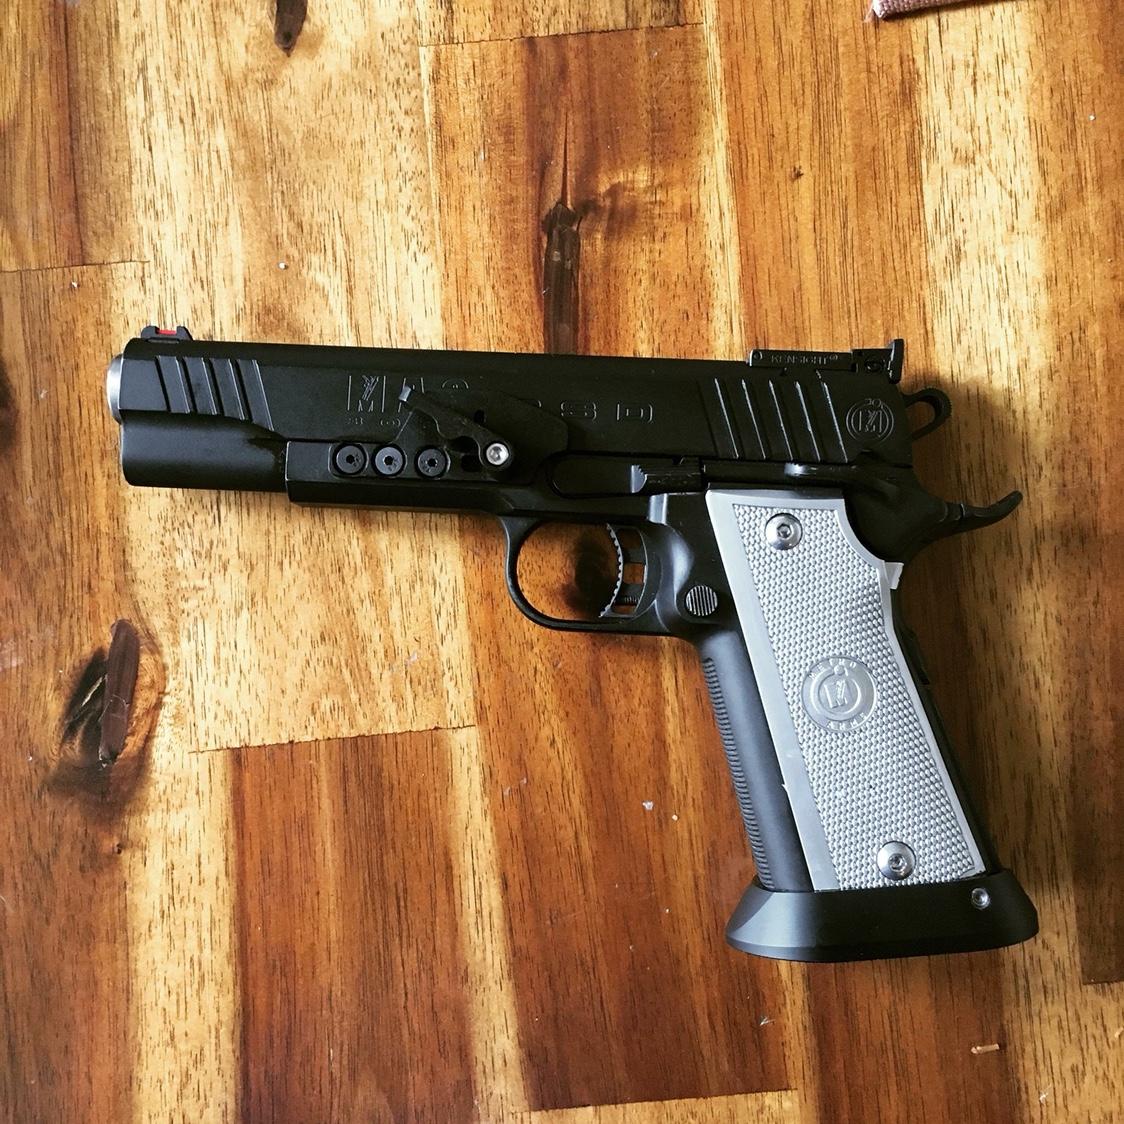 Cheap Limited Gun? - Metro Arms Co MAC 3011 SSD -